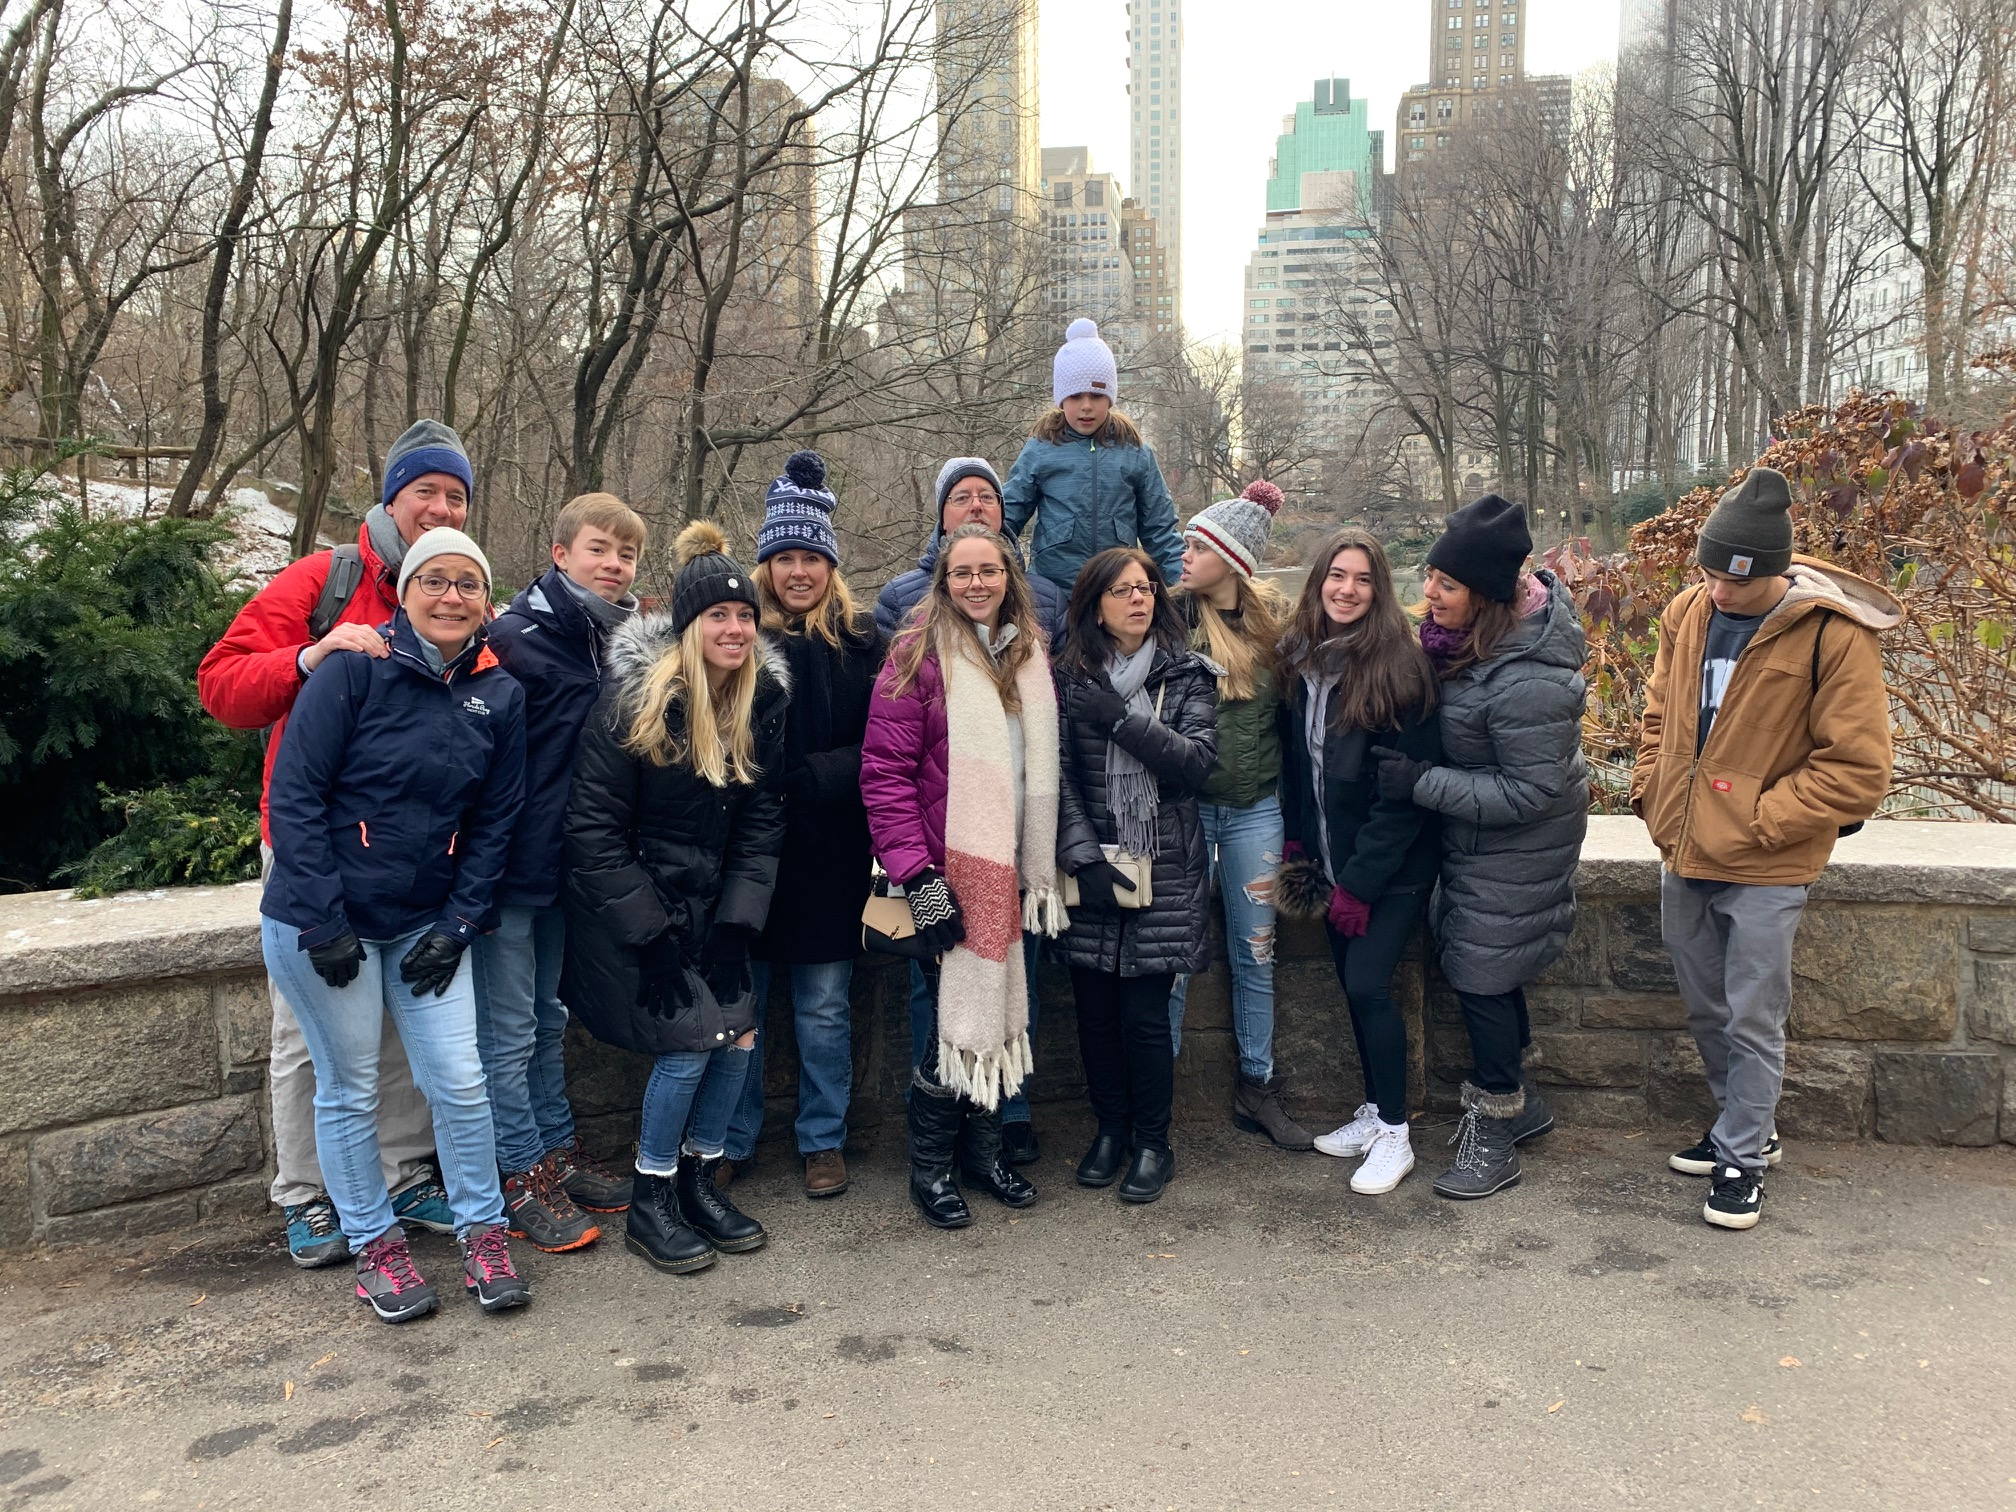 Kathy Gudas Longo & family Dec. 2019, NYC, Central Park